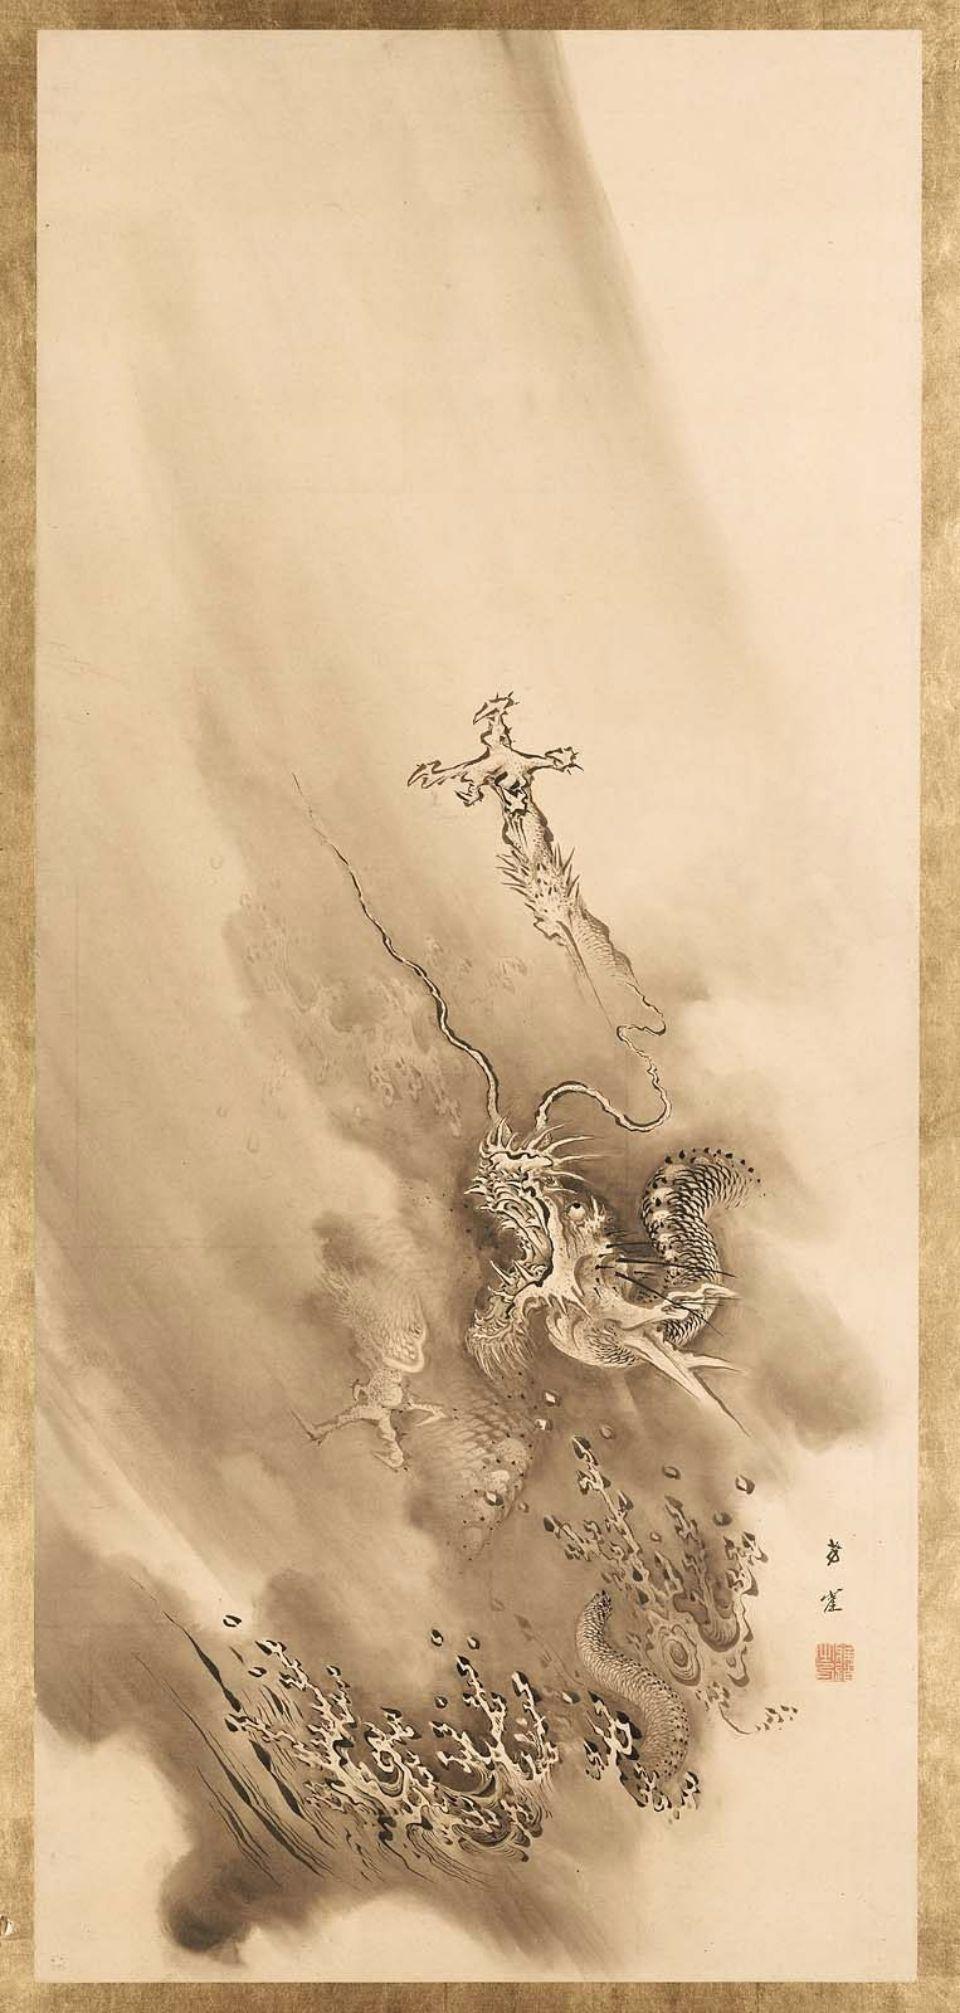 狩野芳崖の画像 p1_12